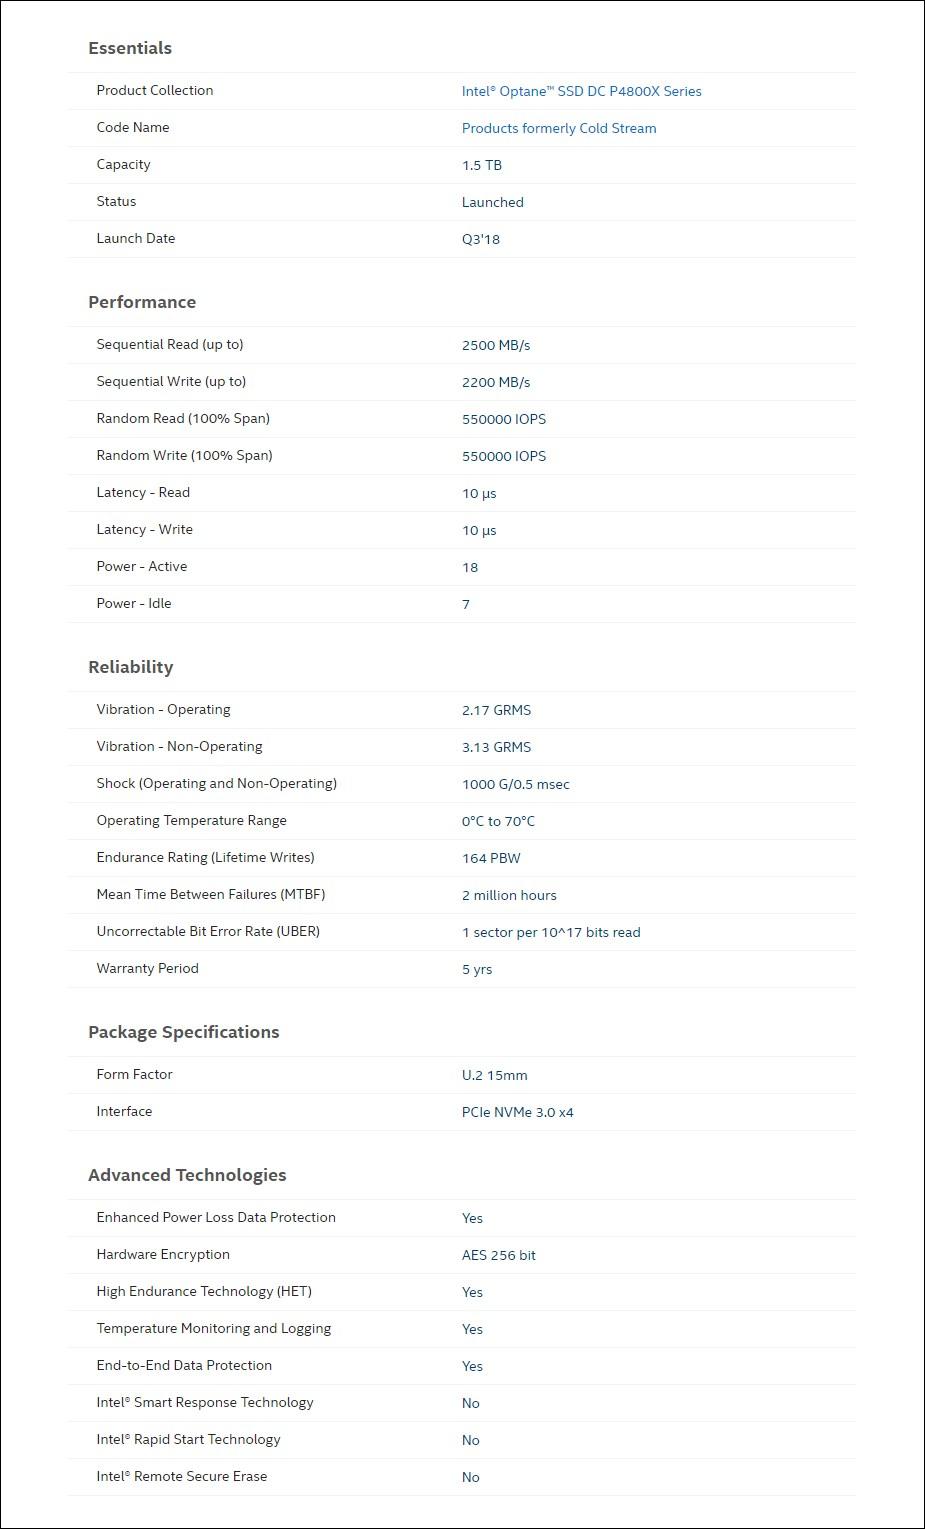 intel-optane-dc-p4800x-saeries-15tb-25-pcie-nvme-ssd-ssdpe21k015ta01-ac26688-1.jpg